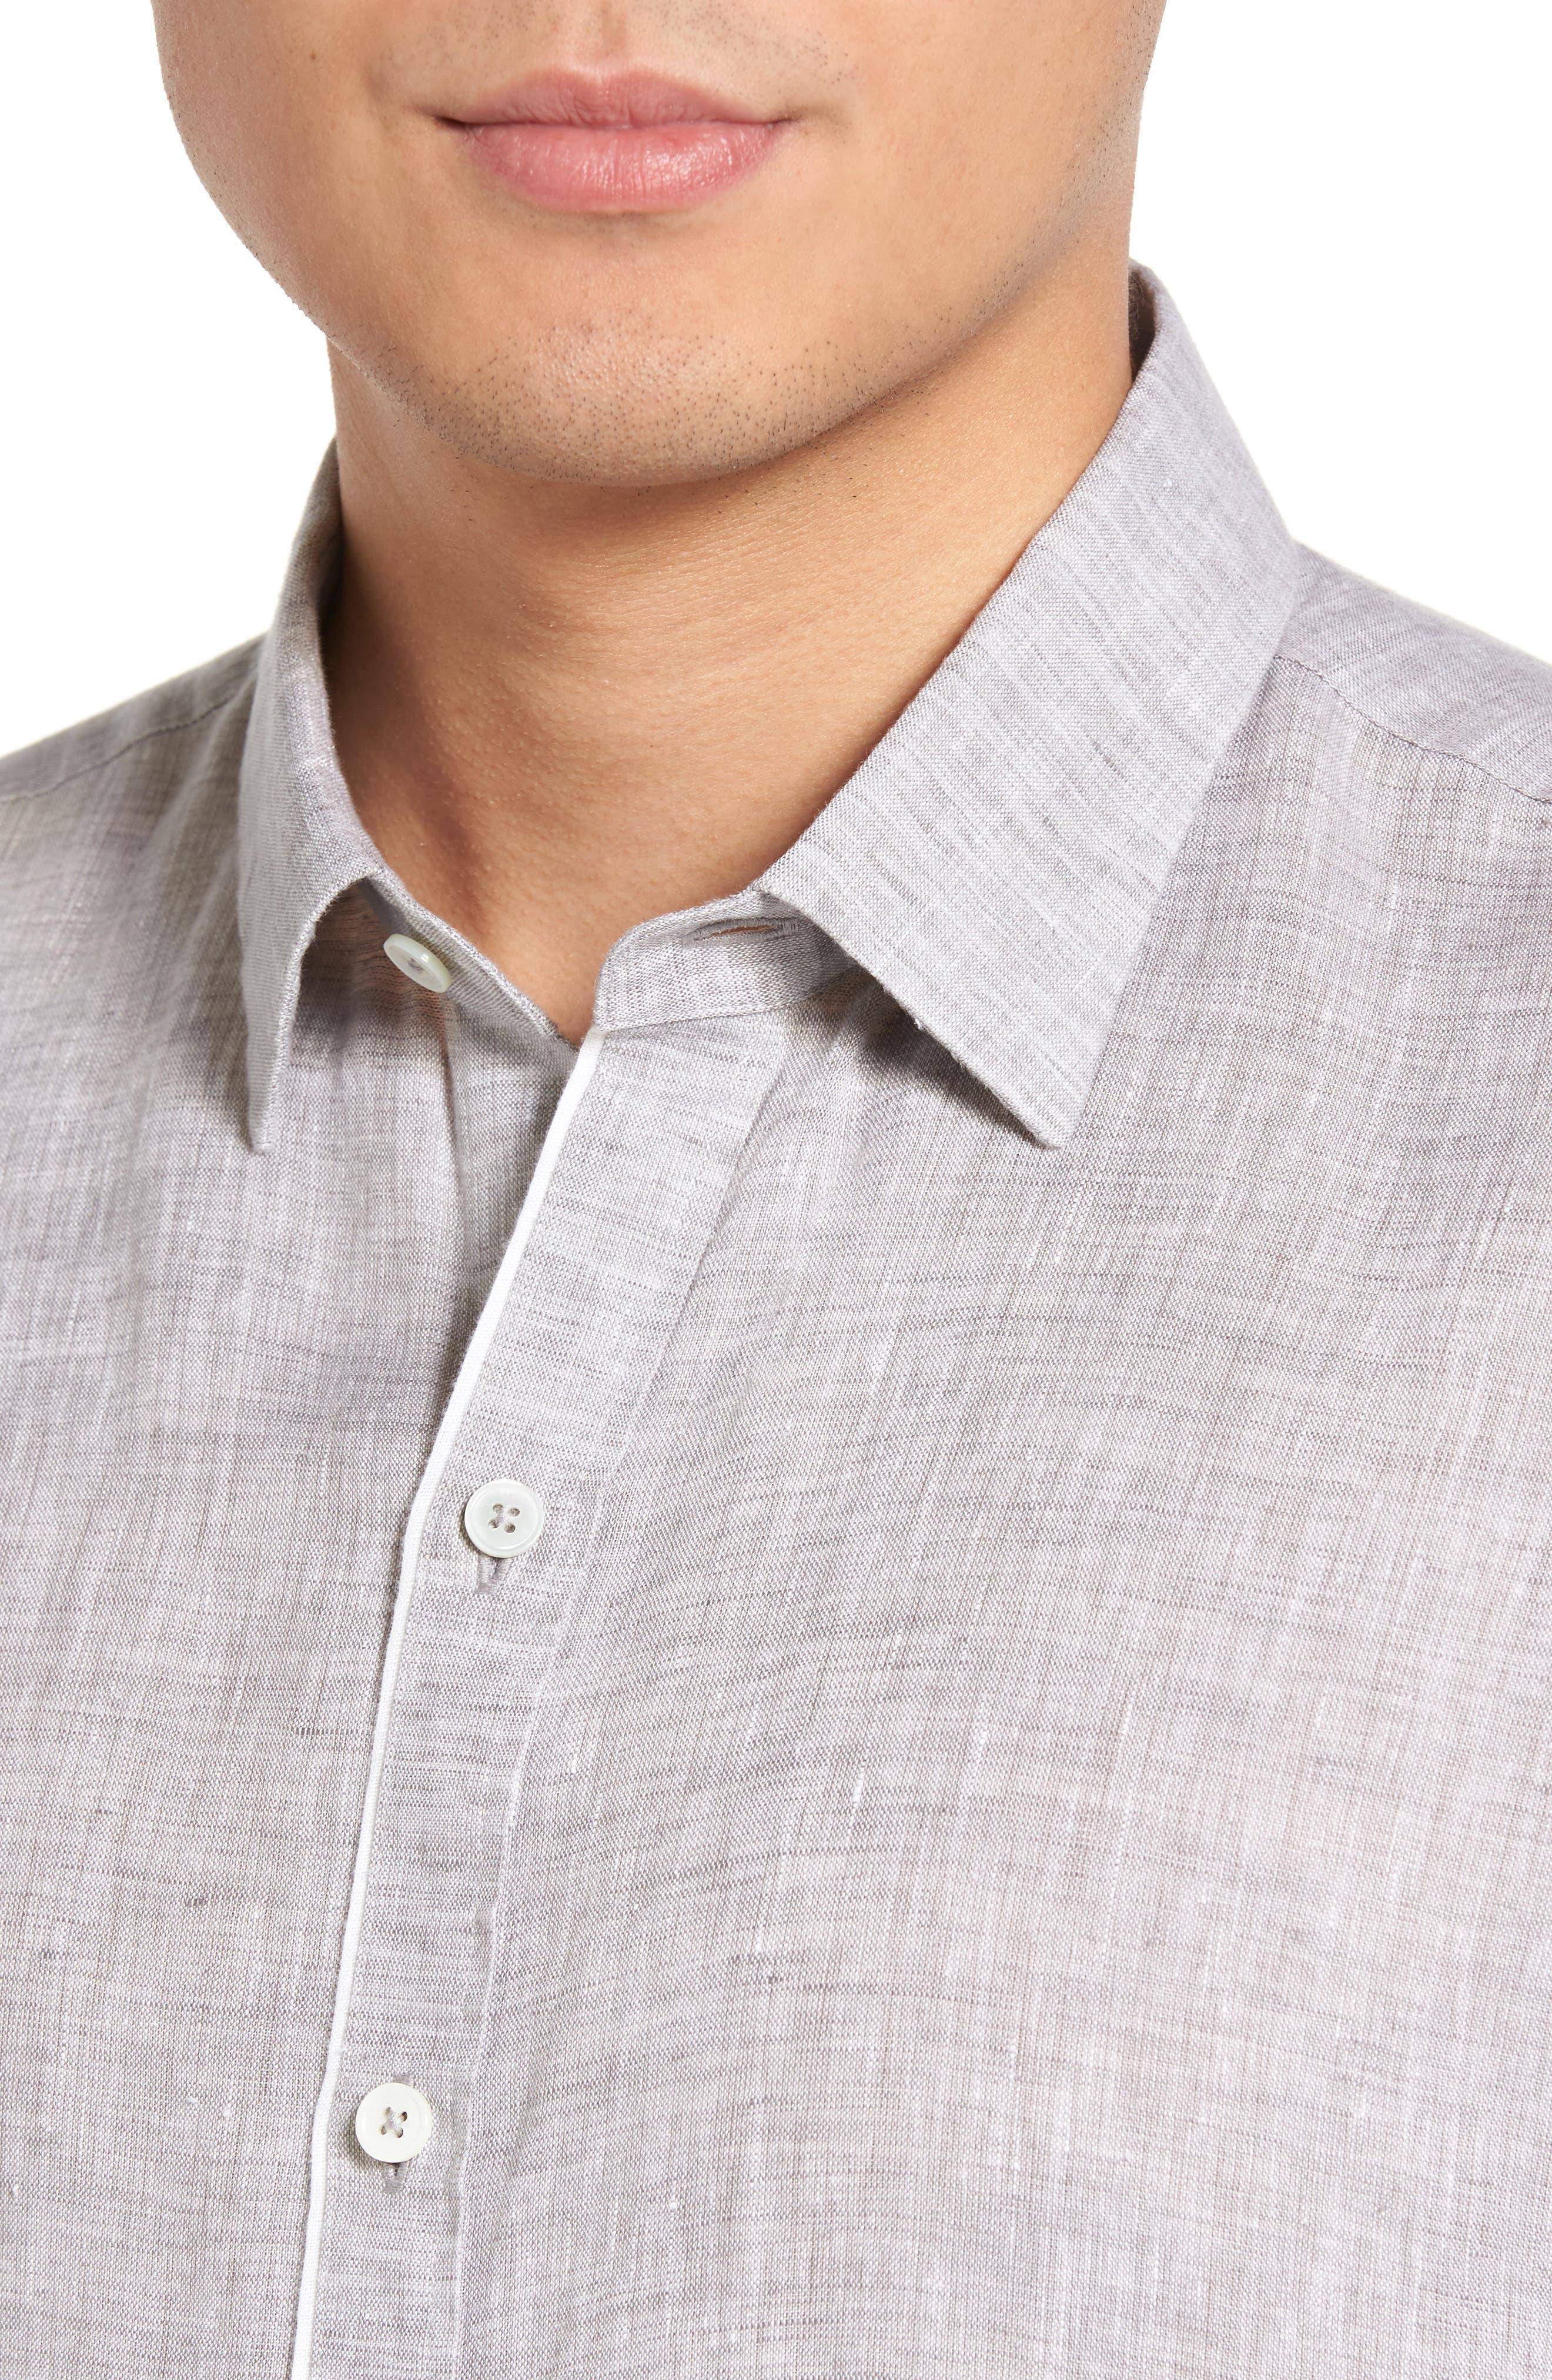 Kaplan Slim Fit Linen Sport Shirt,                             Alternate thumbnail 4, color,                             020